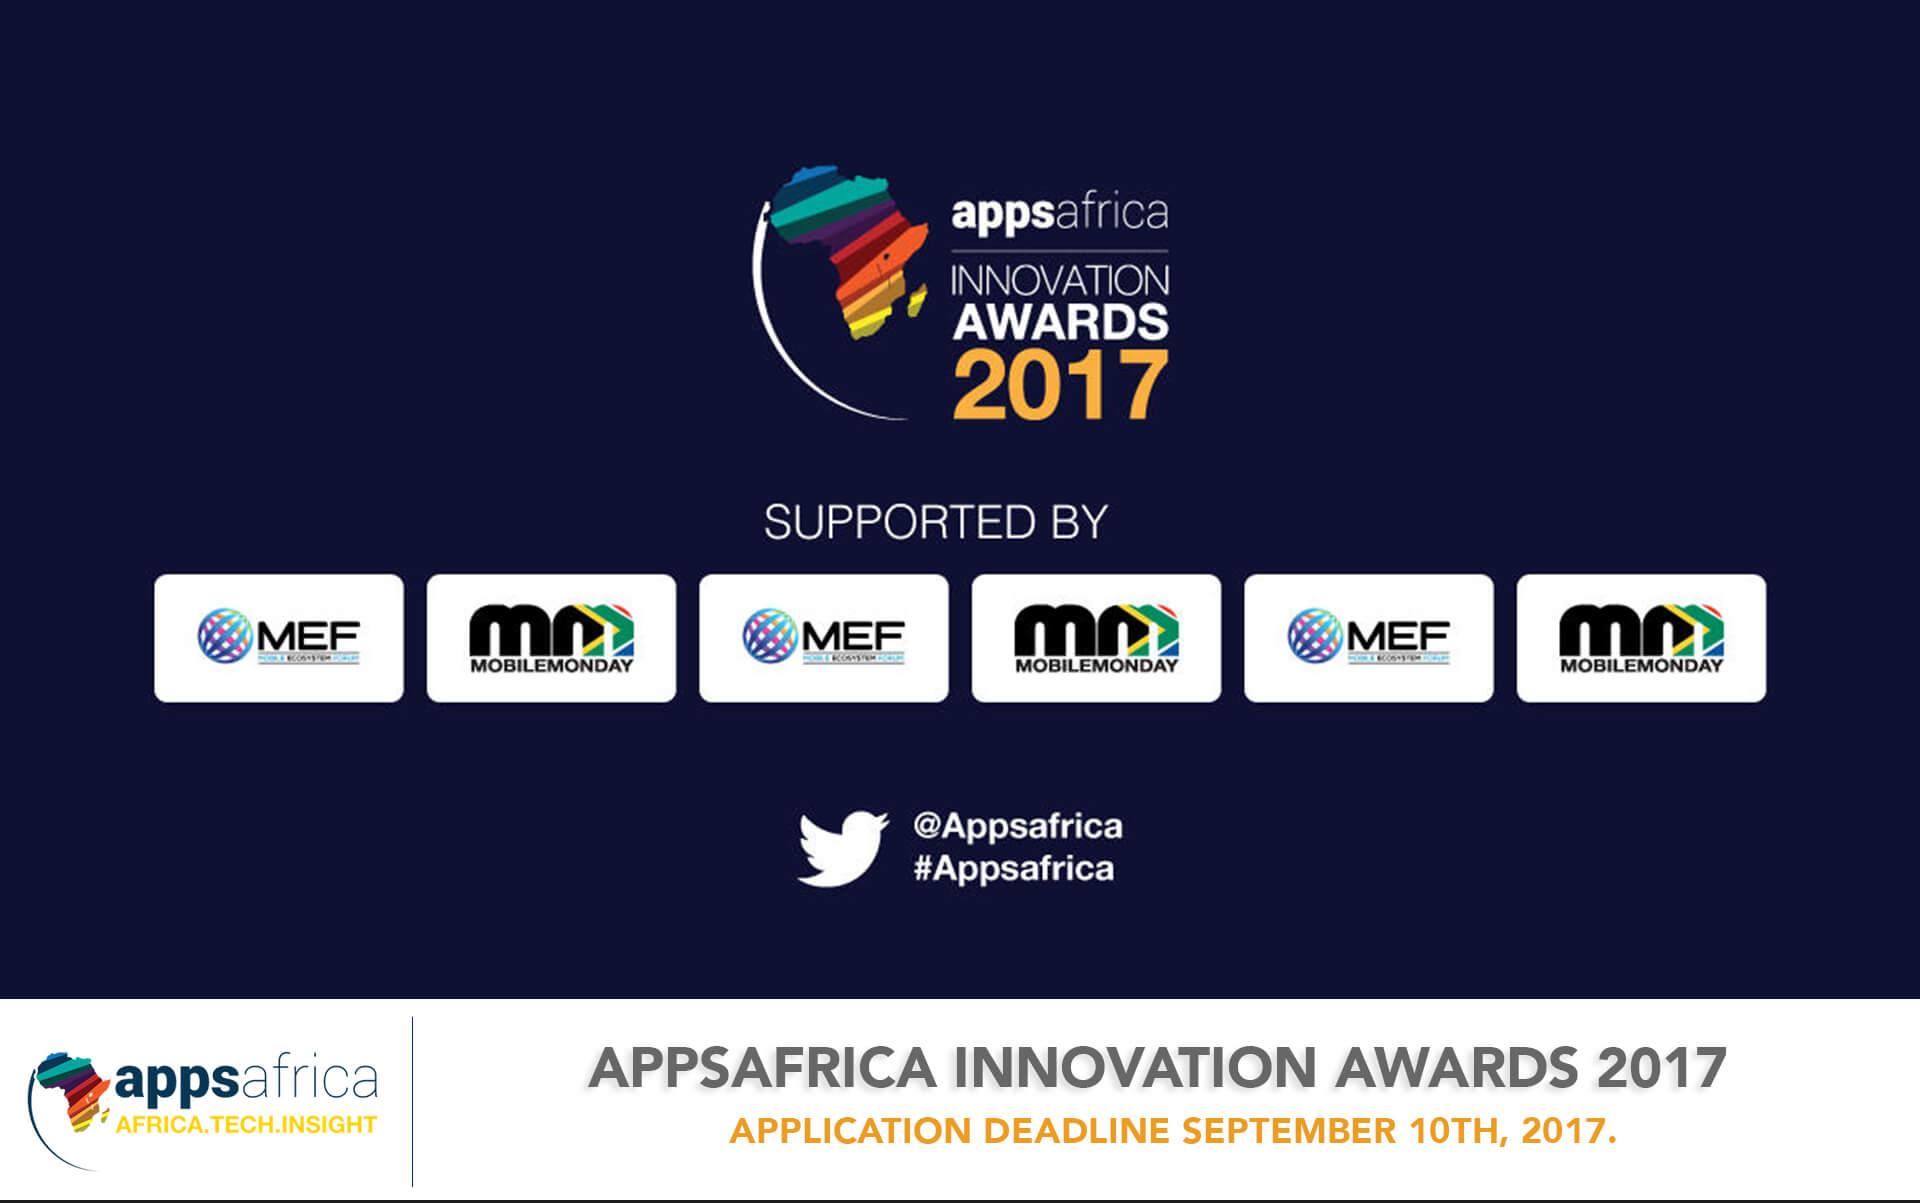 AppsAfrica Innovation Awards 2017 - techgistafrica